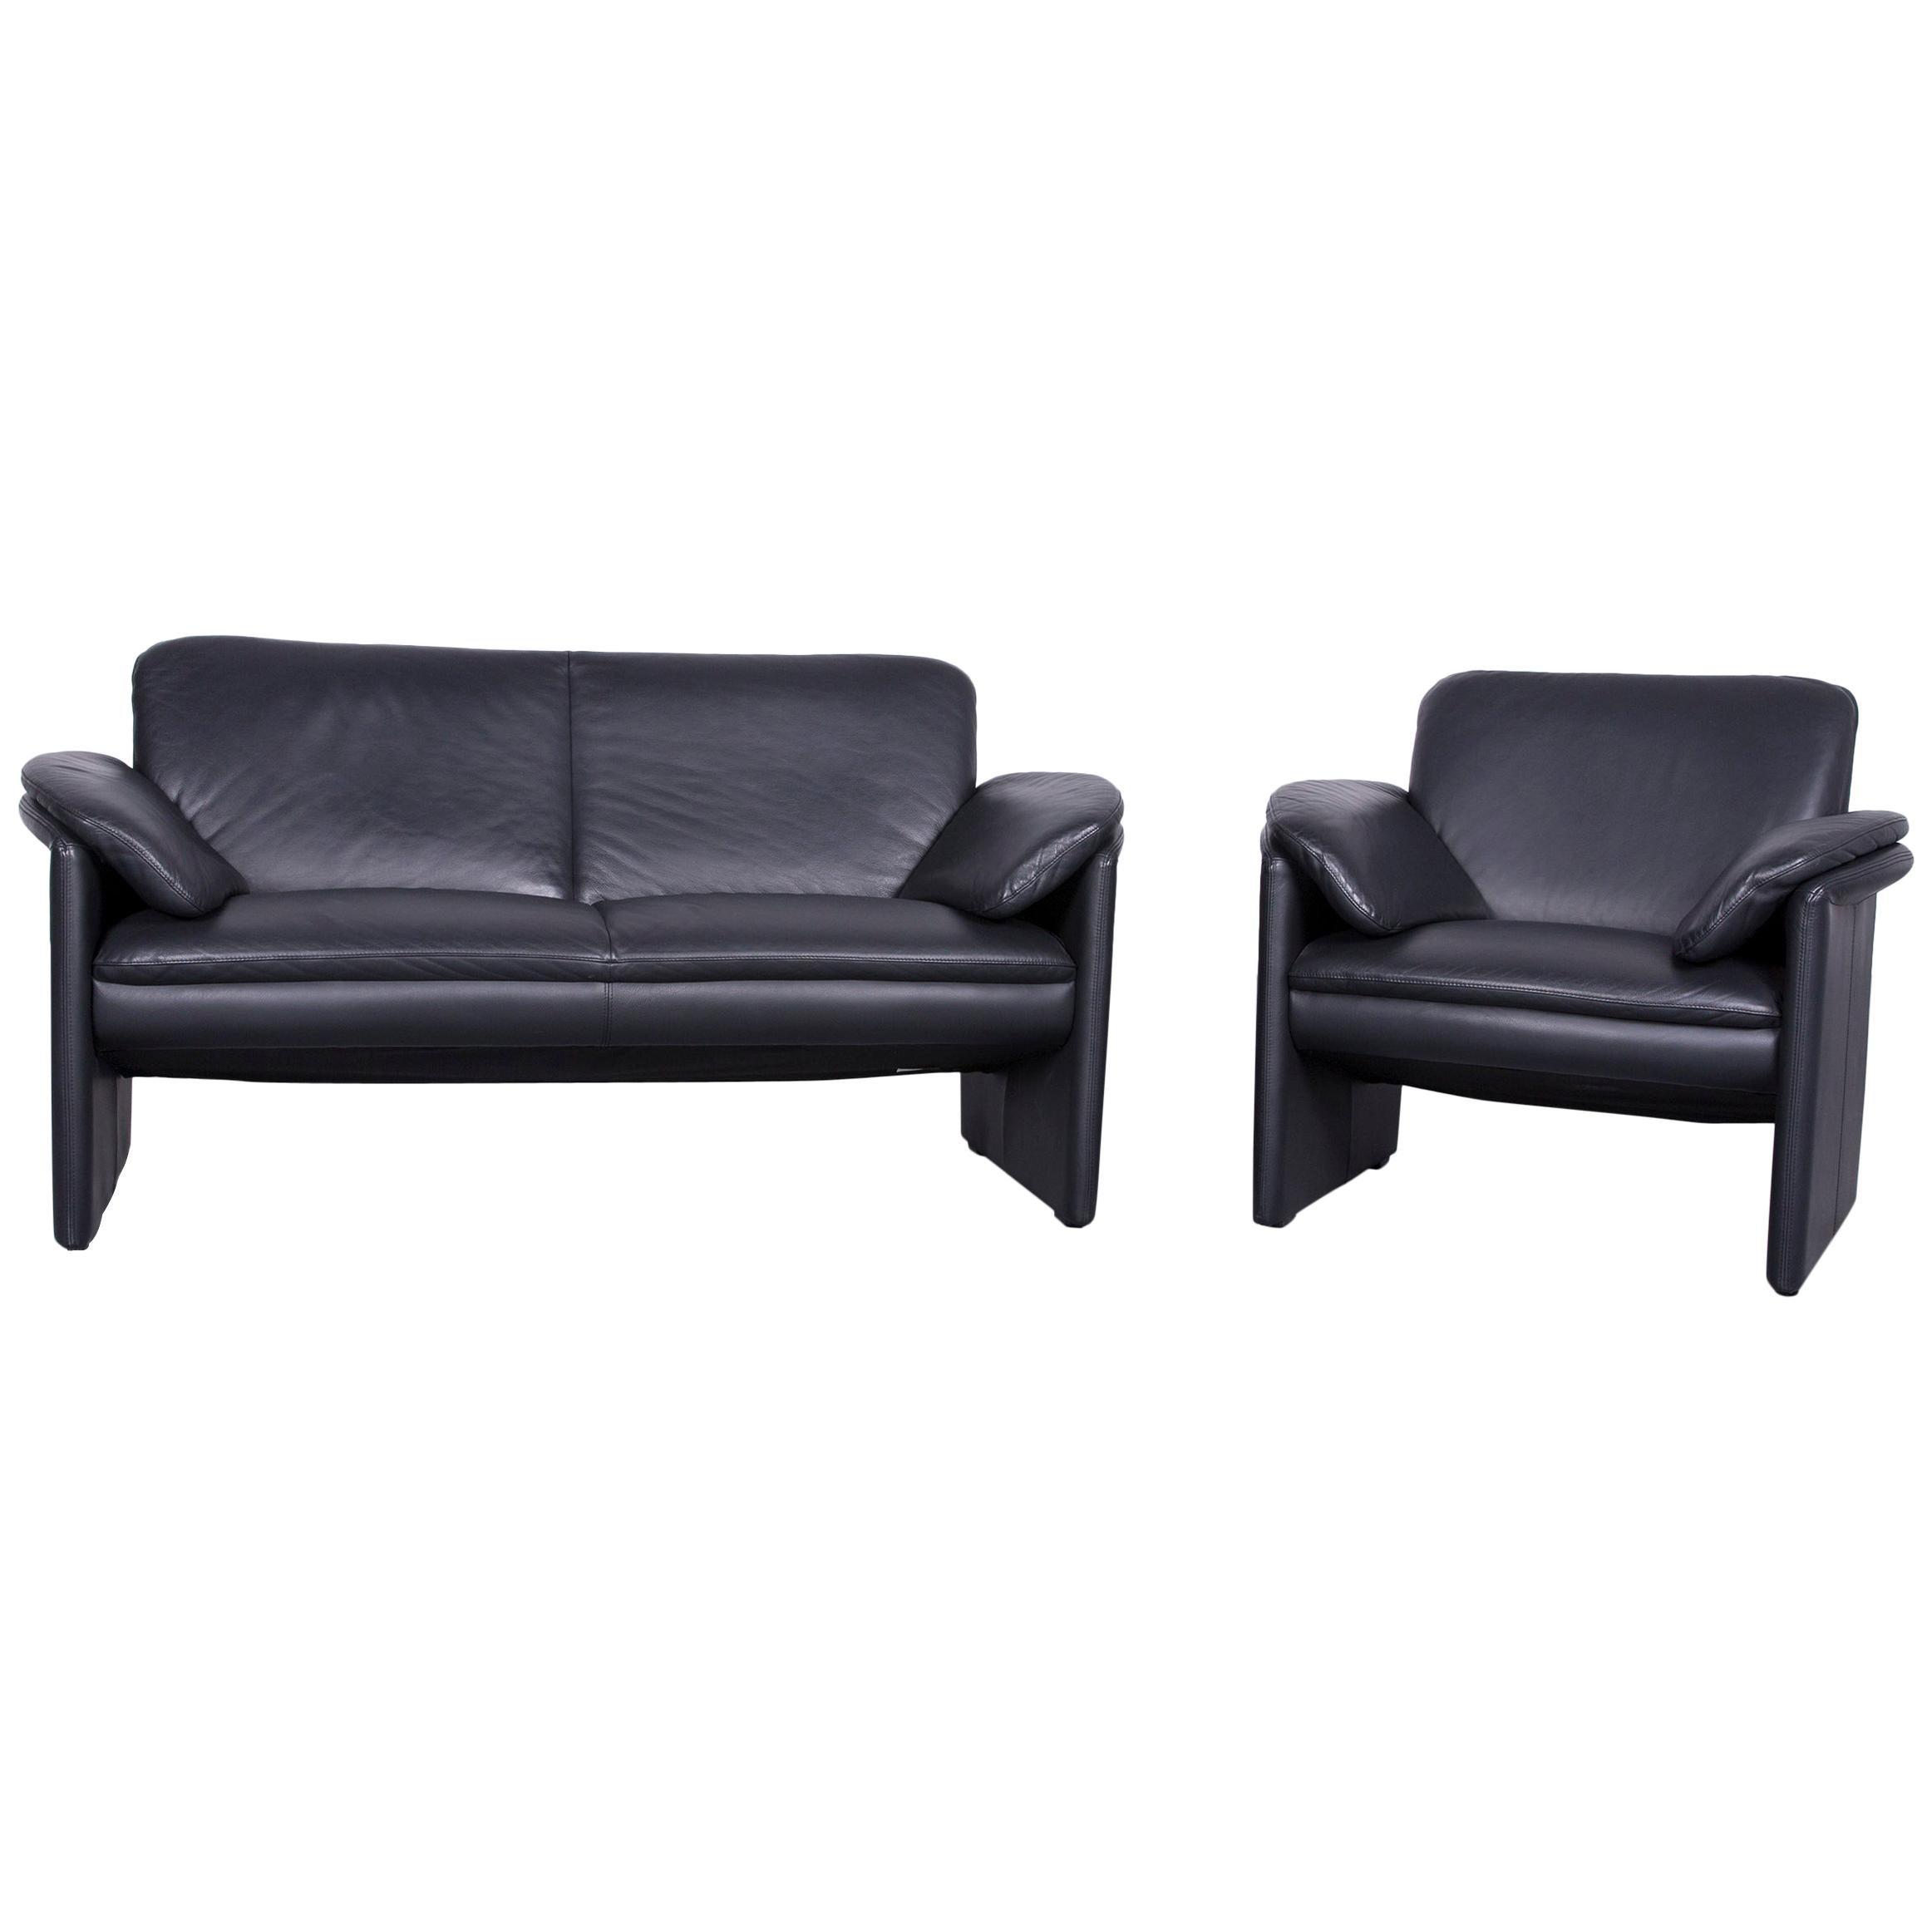 Leolux Catalpa Designer Sofa Armchair Set Leather Black Couch Two Seat